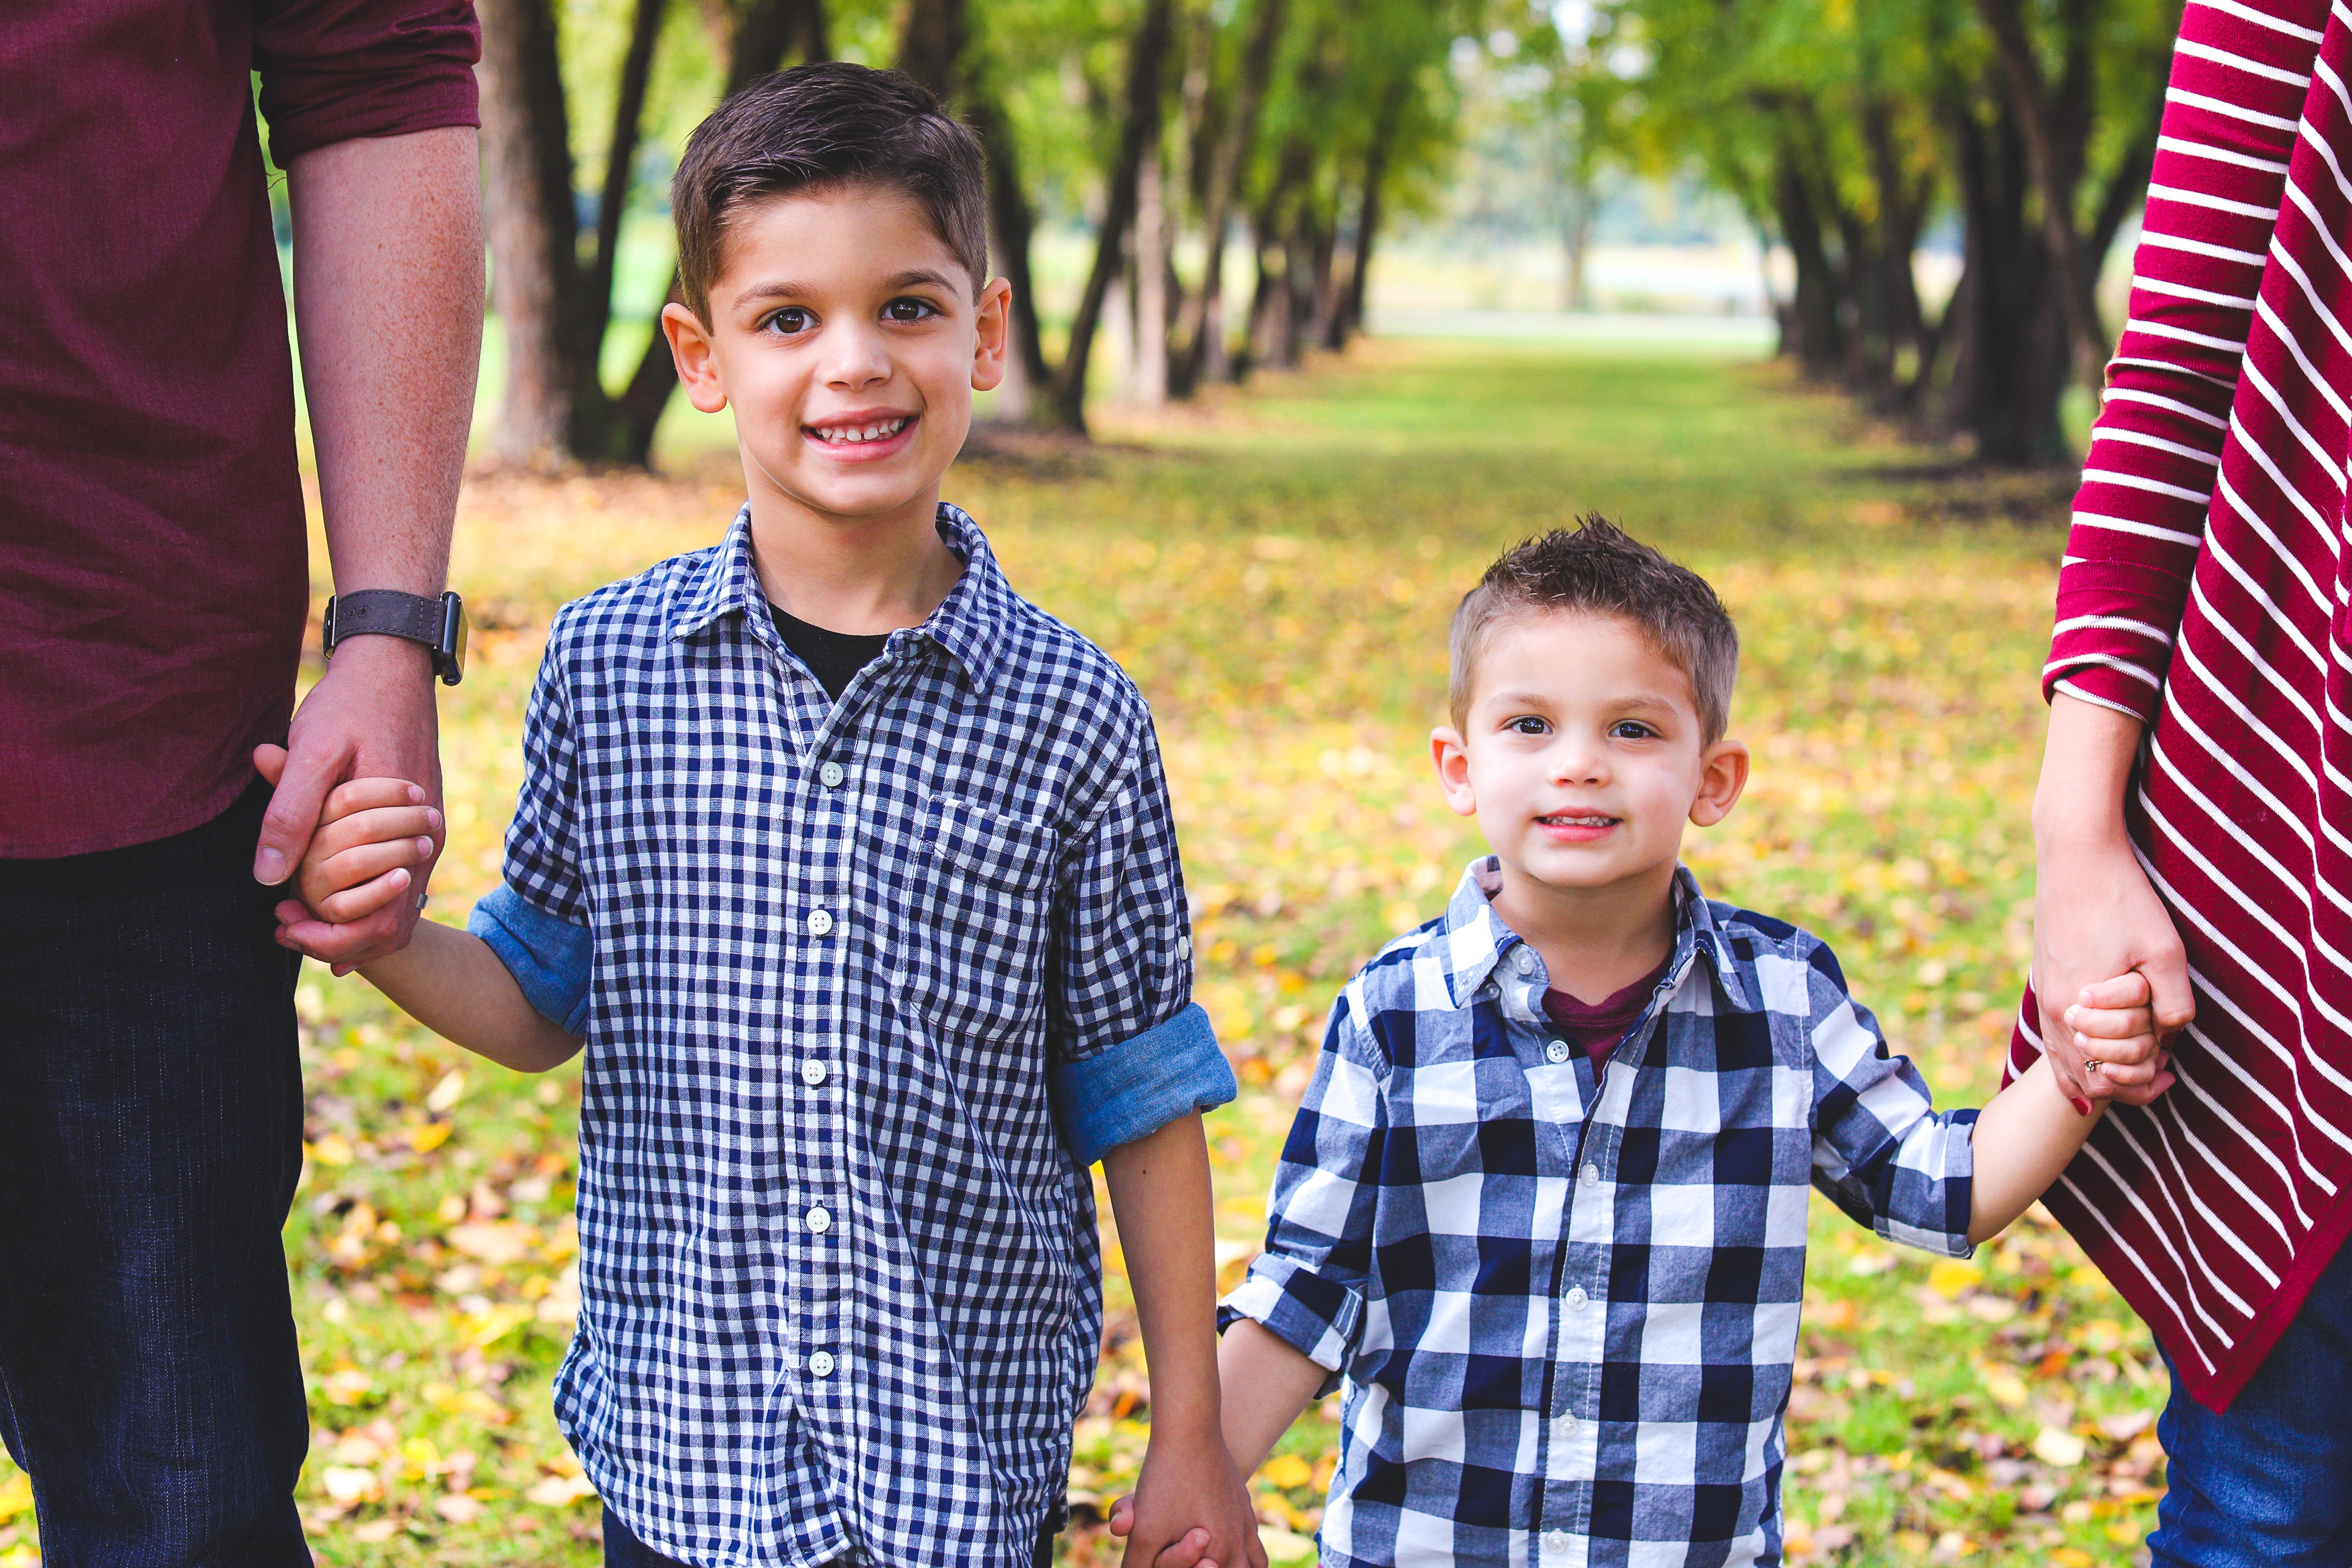 beccihethcoatphotography-family photographer-wheaton-2